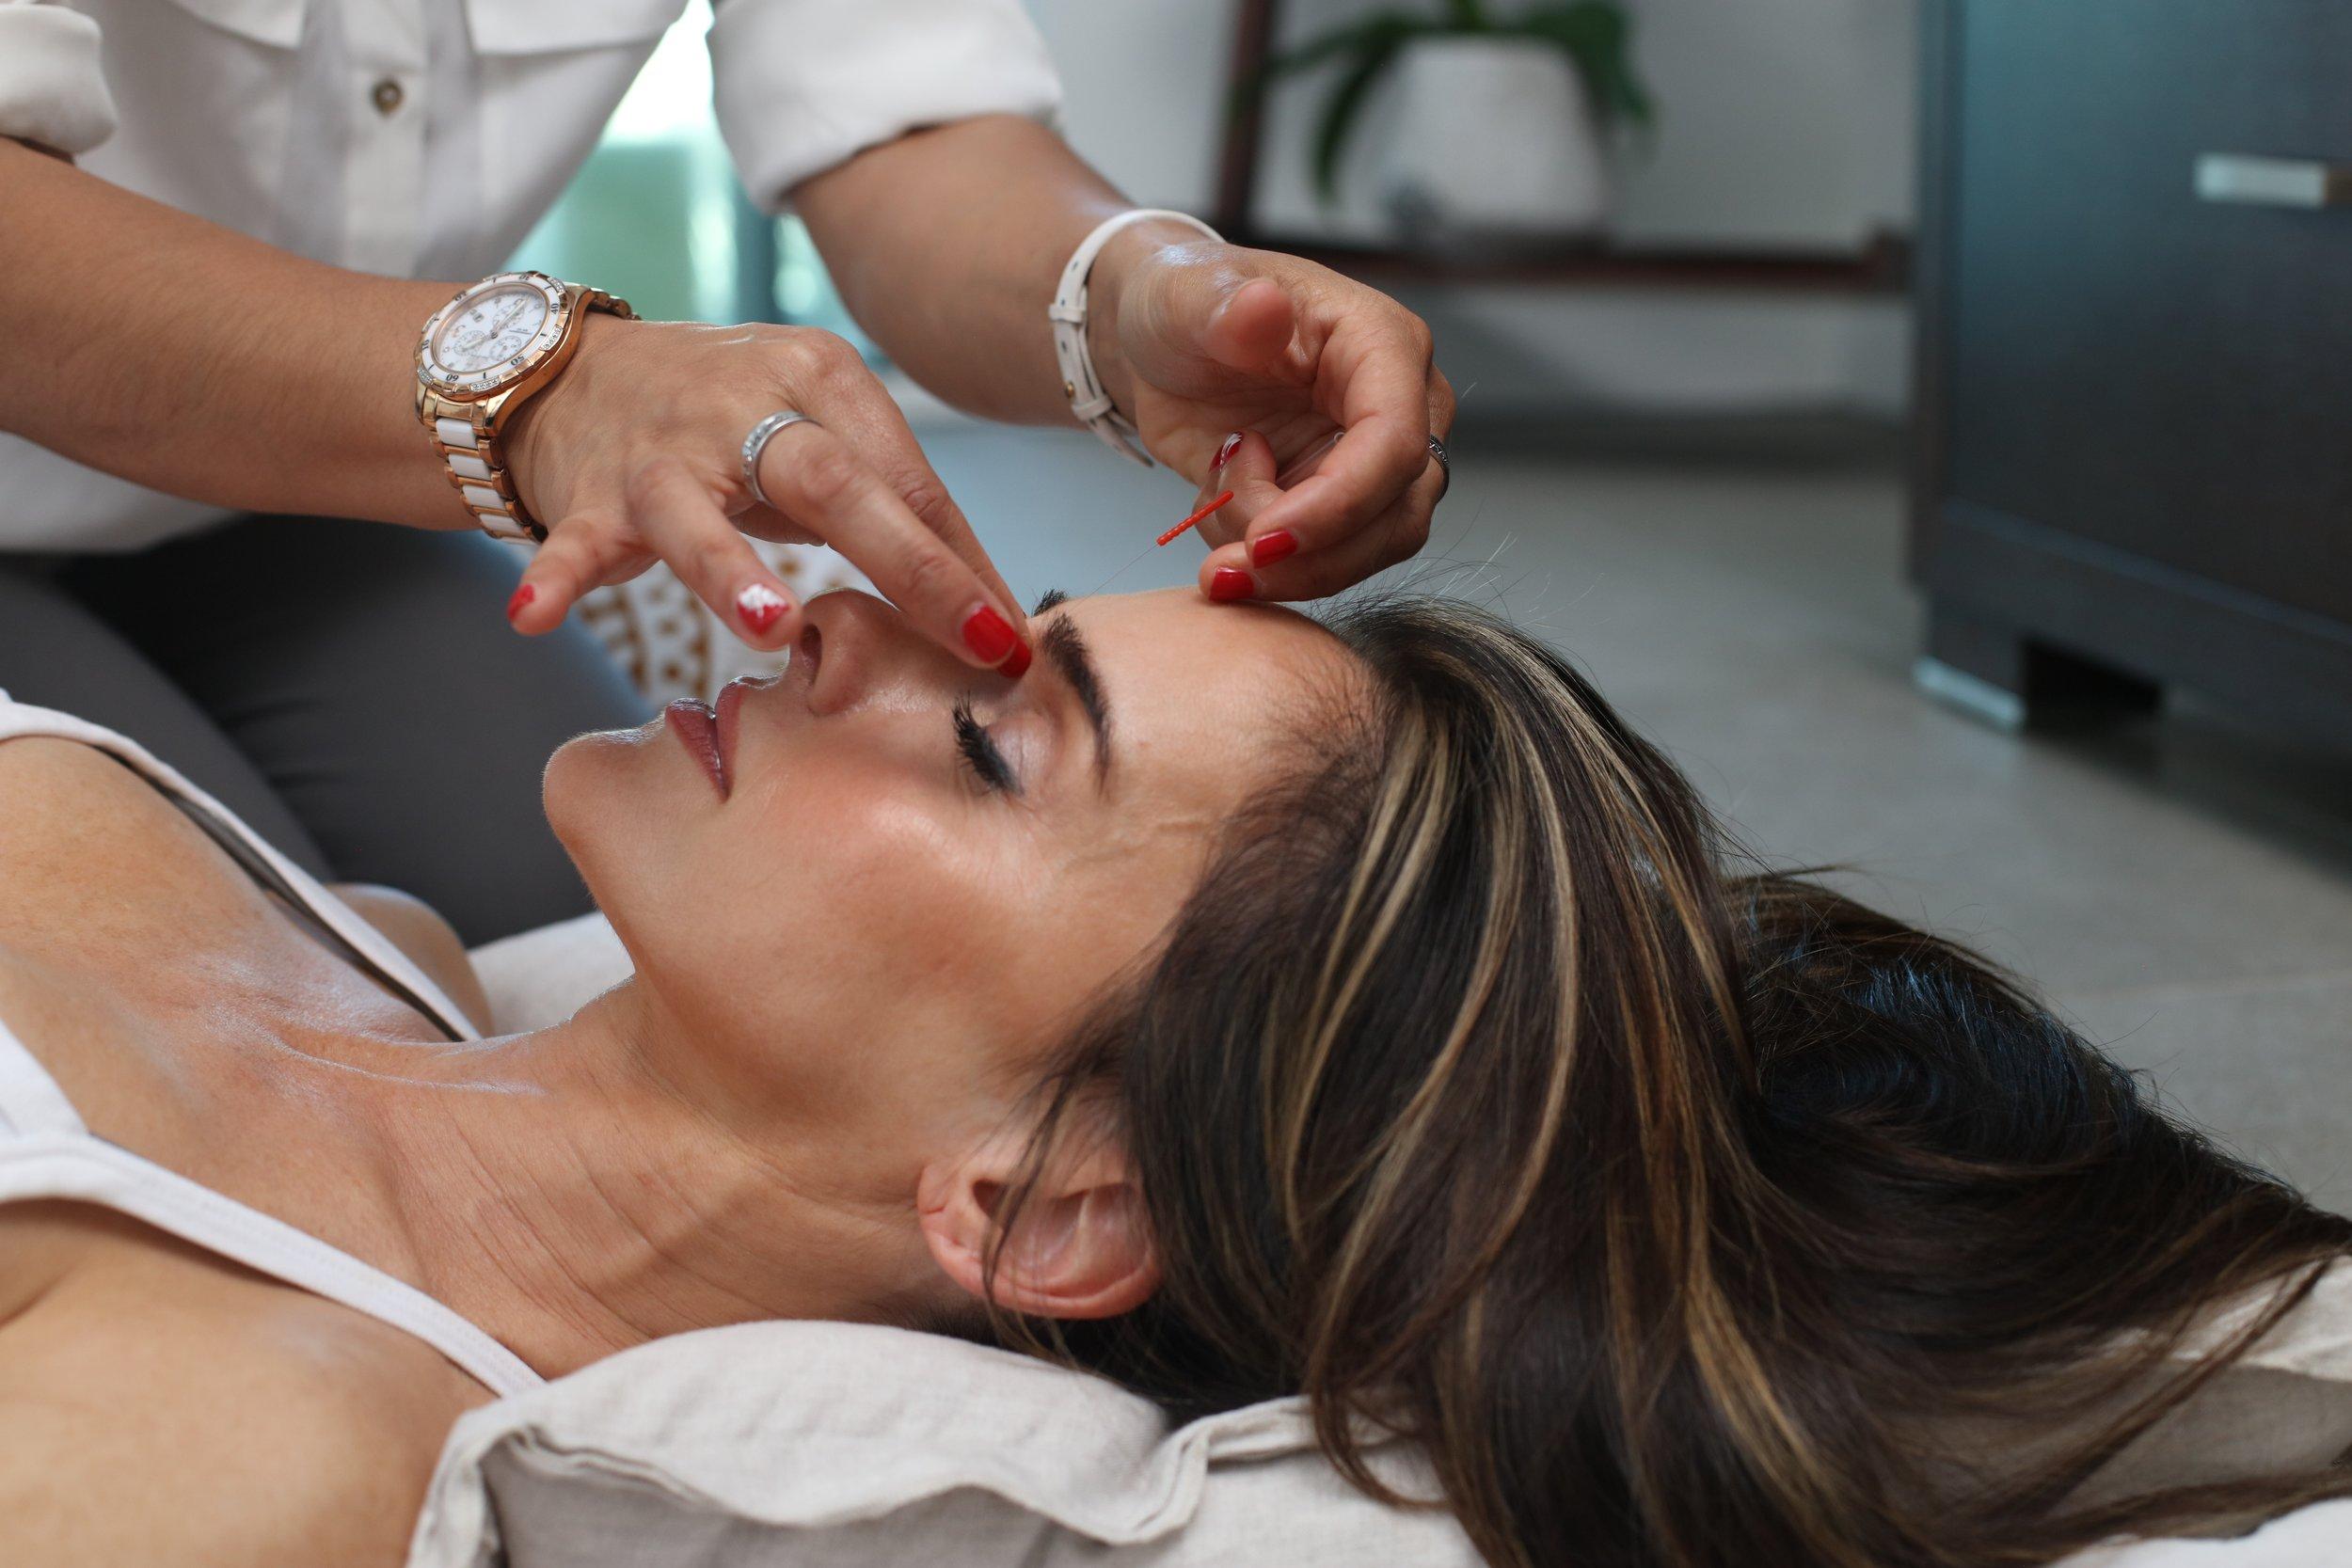 Body Work - We offer Thai Massage, Reflexology, Acupressure, Jin Shin Do, Scar Tissue Release, Theta Healing, Cranial Sacral, Osteopathy, Healing Touch and Bowen Pain Release.